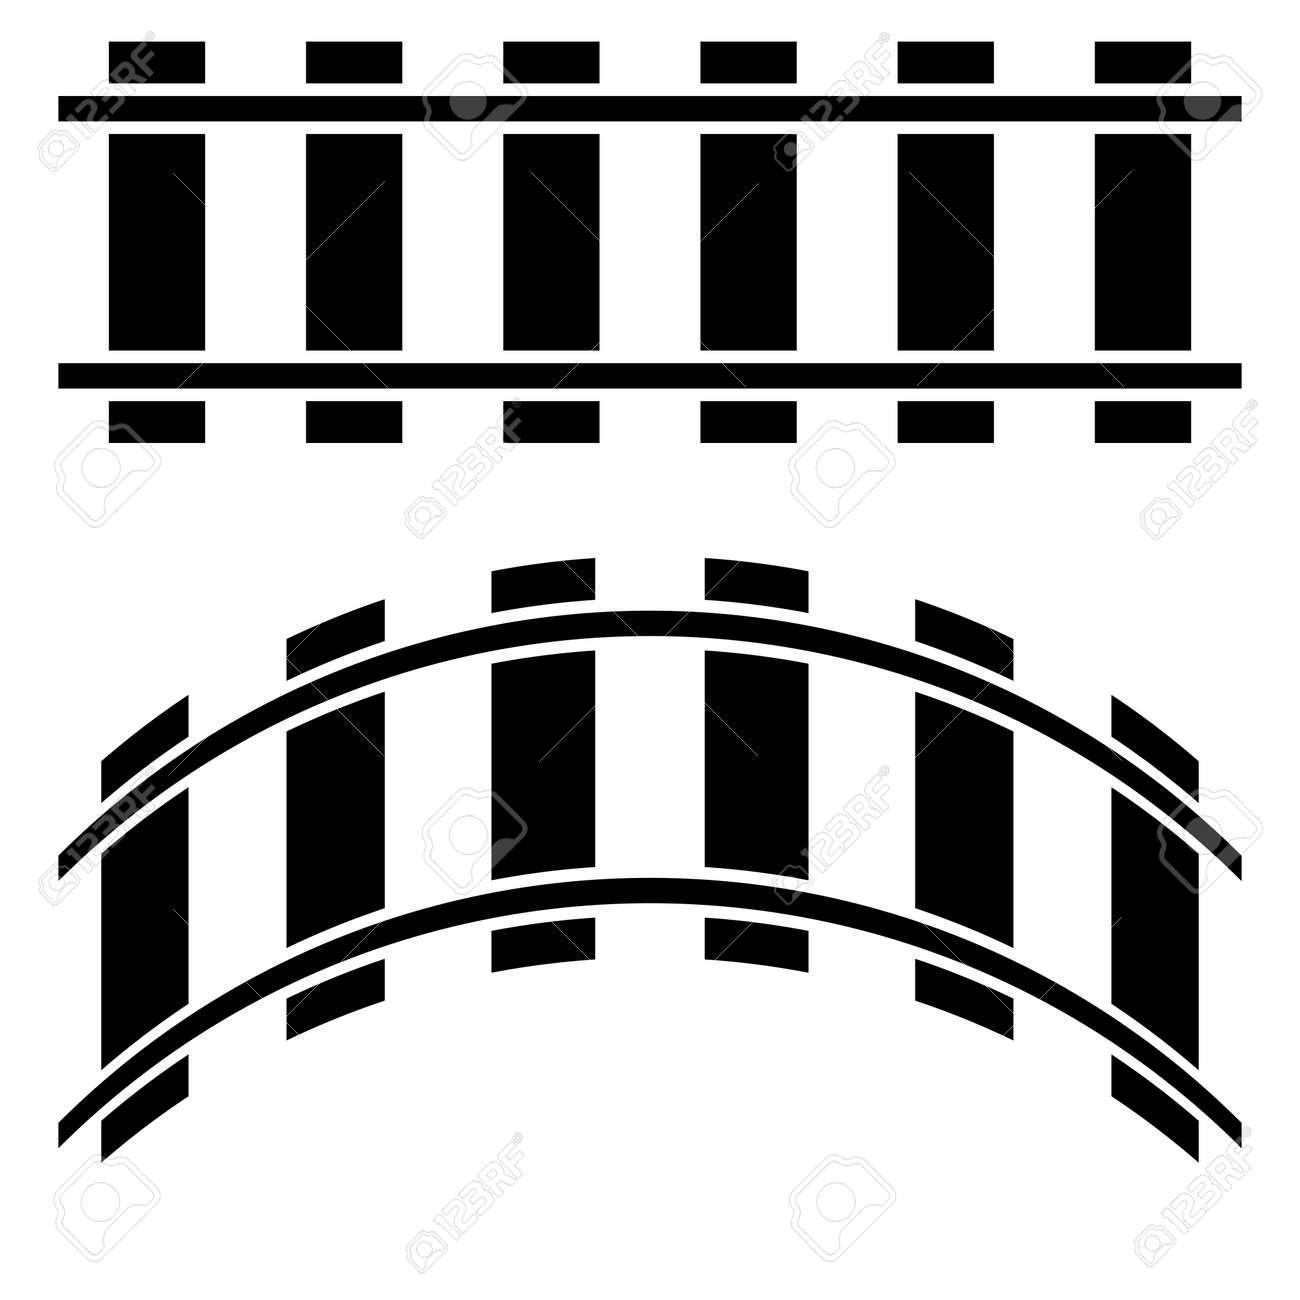 Railroad, Train track, Railway contour, silhouette vector. Tramway, metro, subway path – Stock illustration, Clip art graphics - 167559612